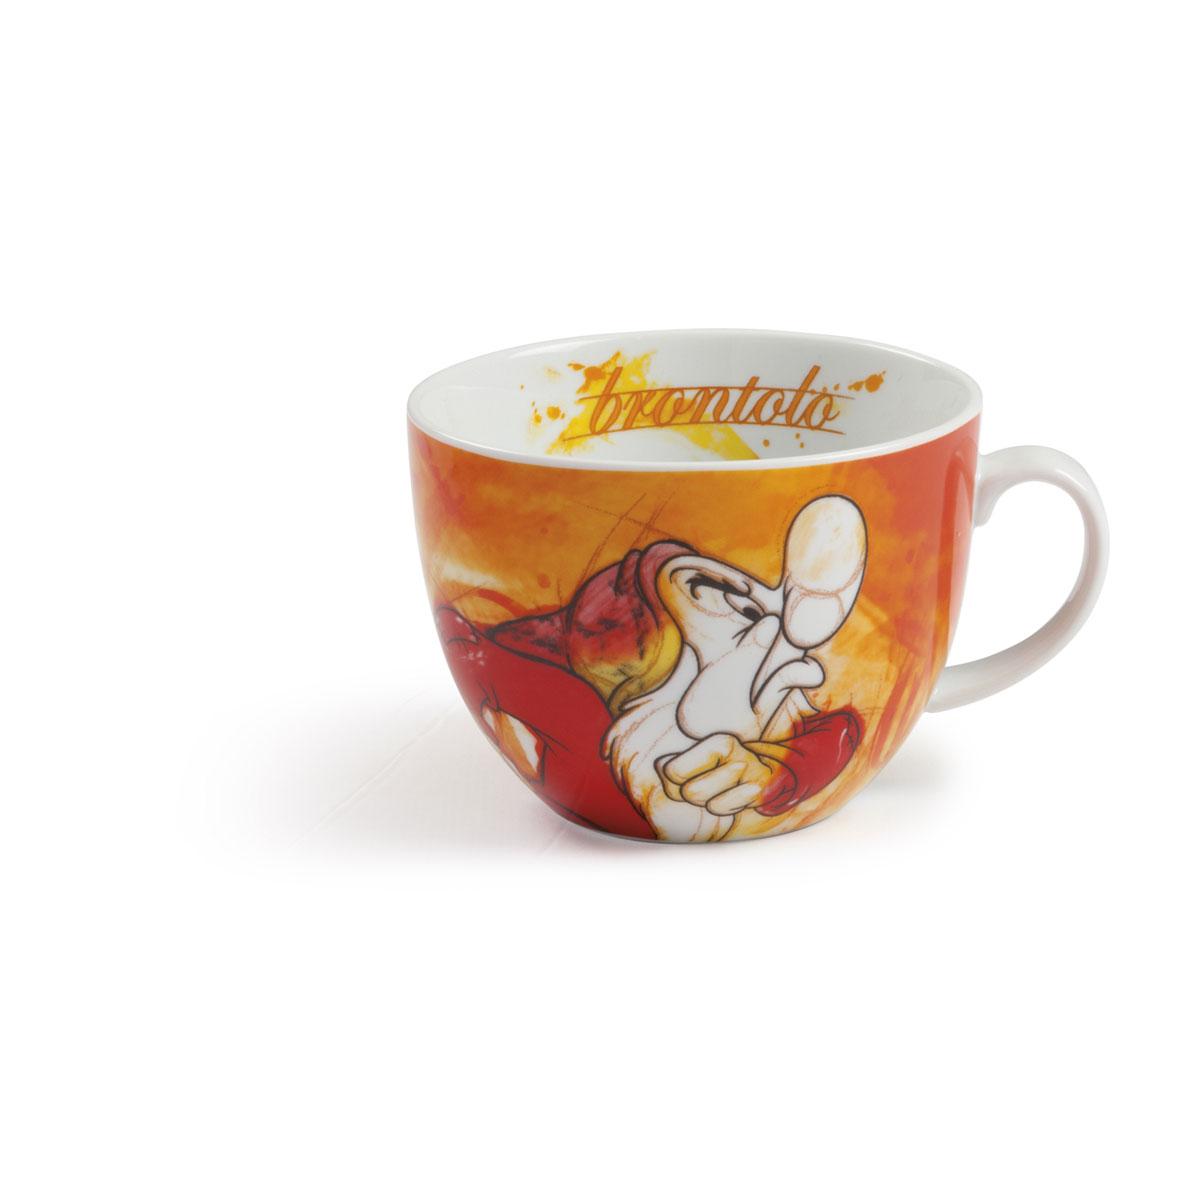 Cappuccino Cup Grumpy 7 Dwarfs - Disney Home